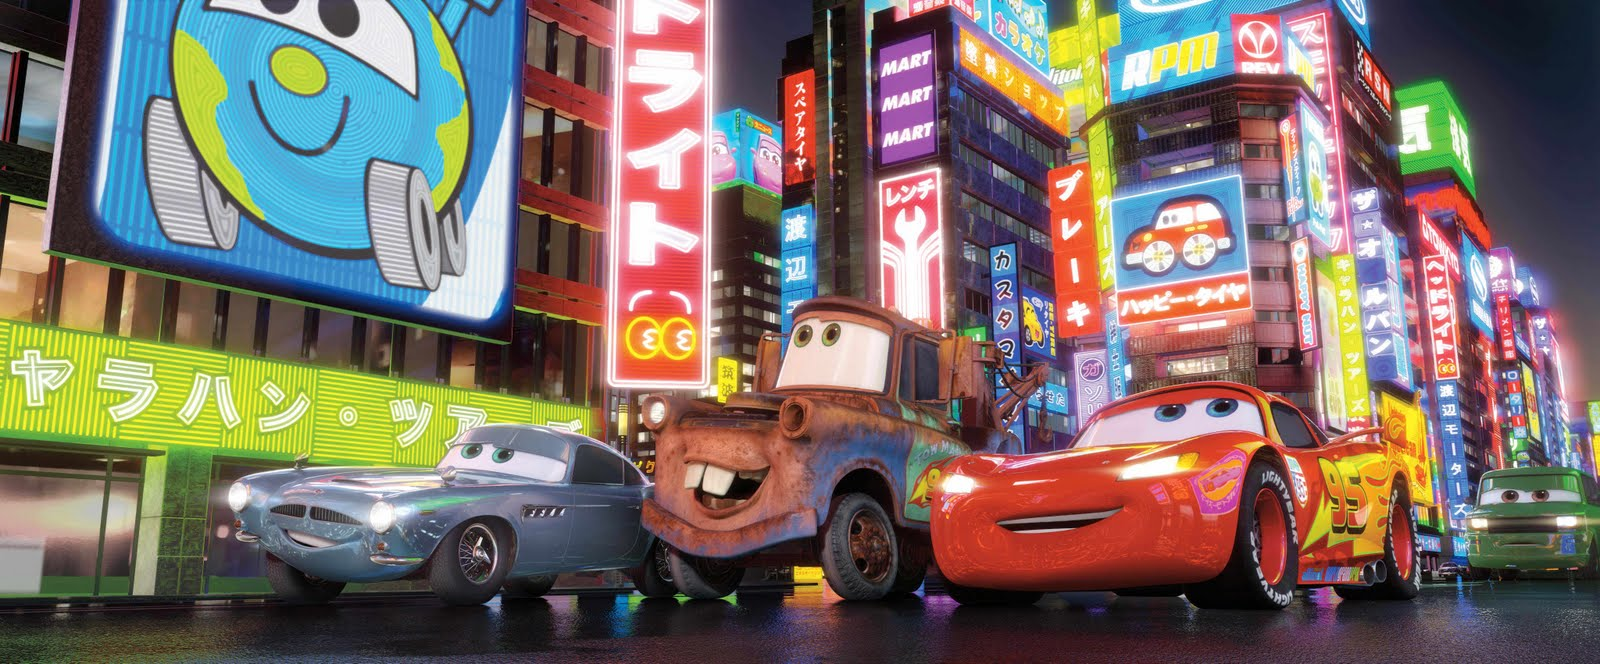 Mas imagenes de personajes de cars 2